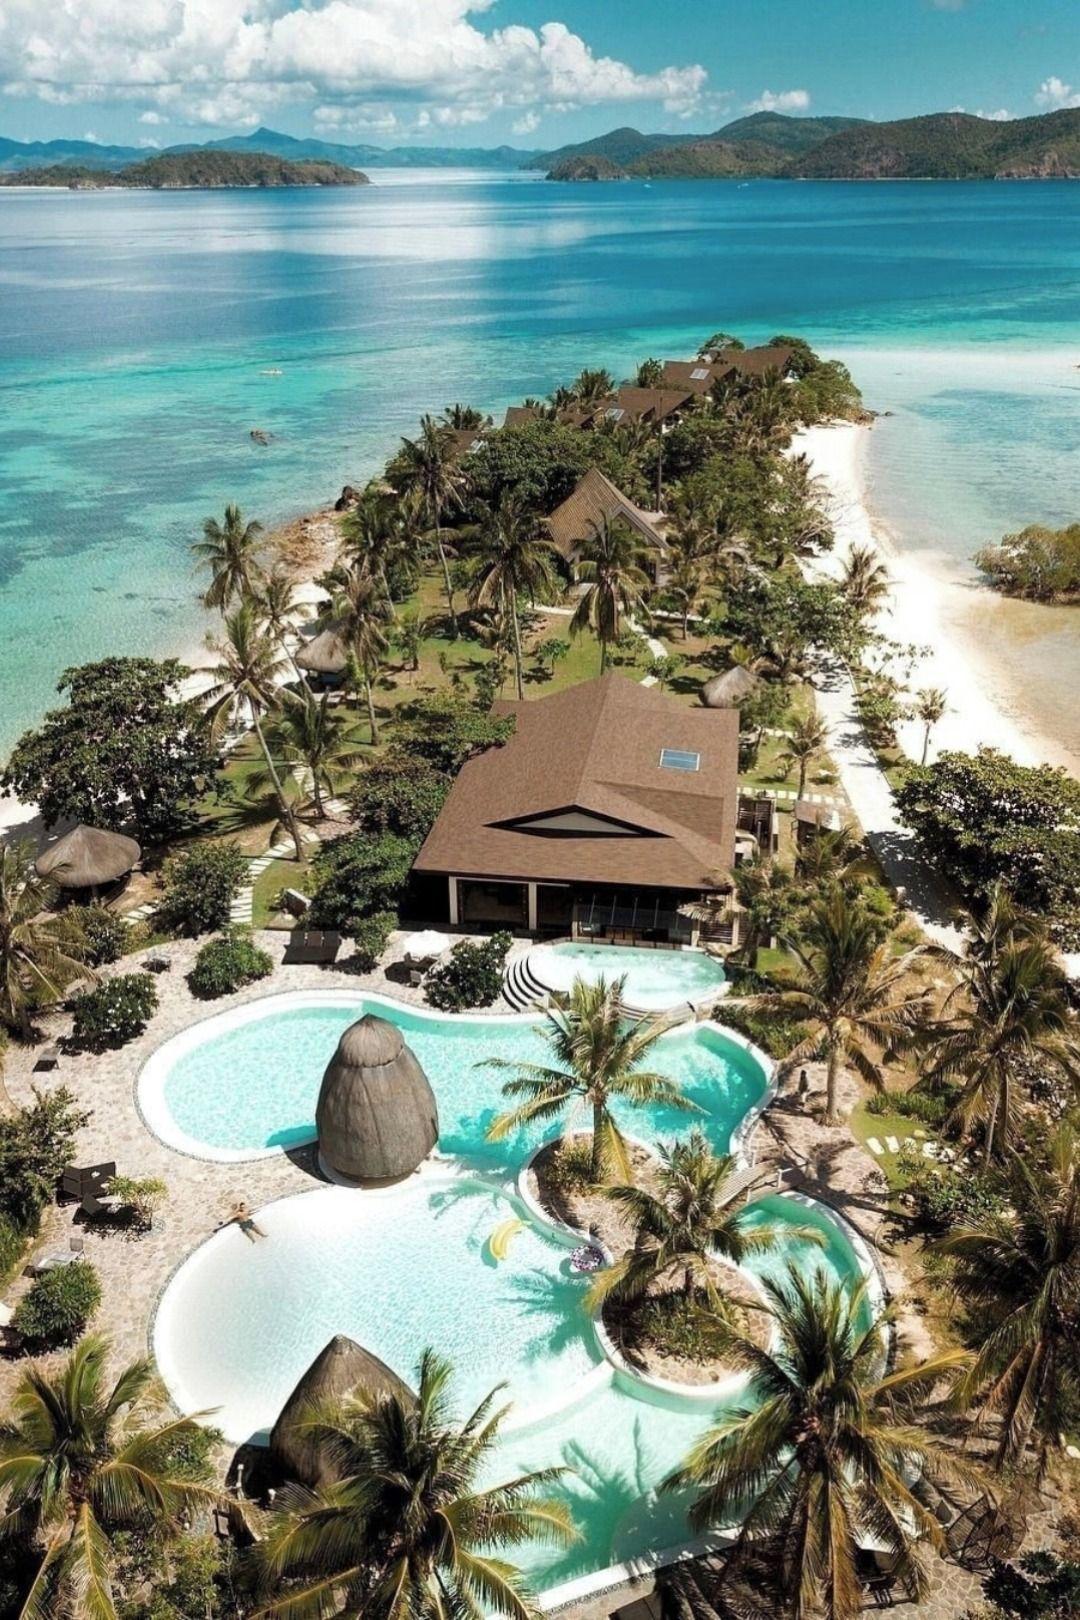 37 Most Beautiful Islands In The World In 2020 Coron Island Vacation Trips Coron Palawan